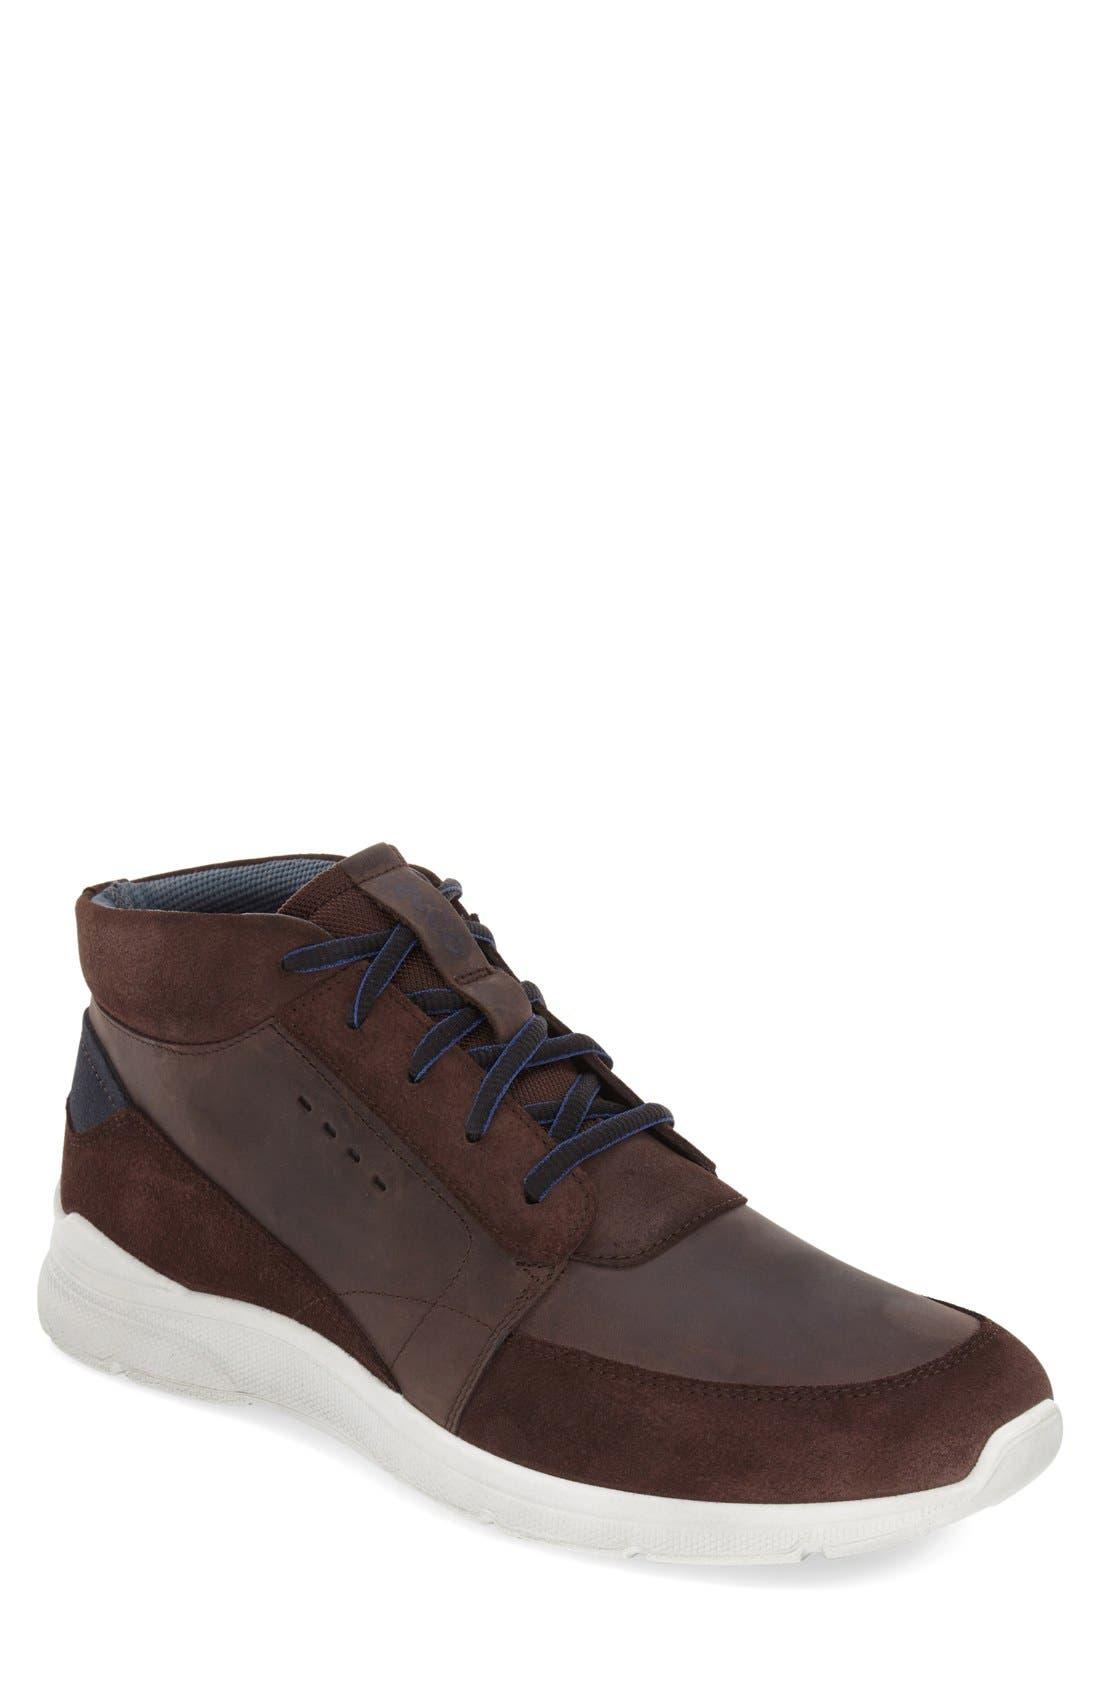 'Irondale Retro' High Top Sneaker,                         Main,                         color, 206